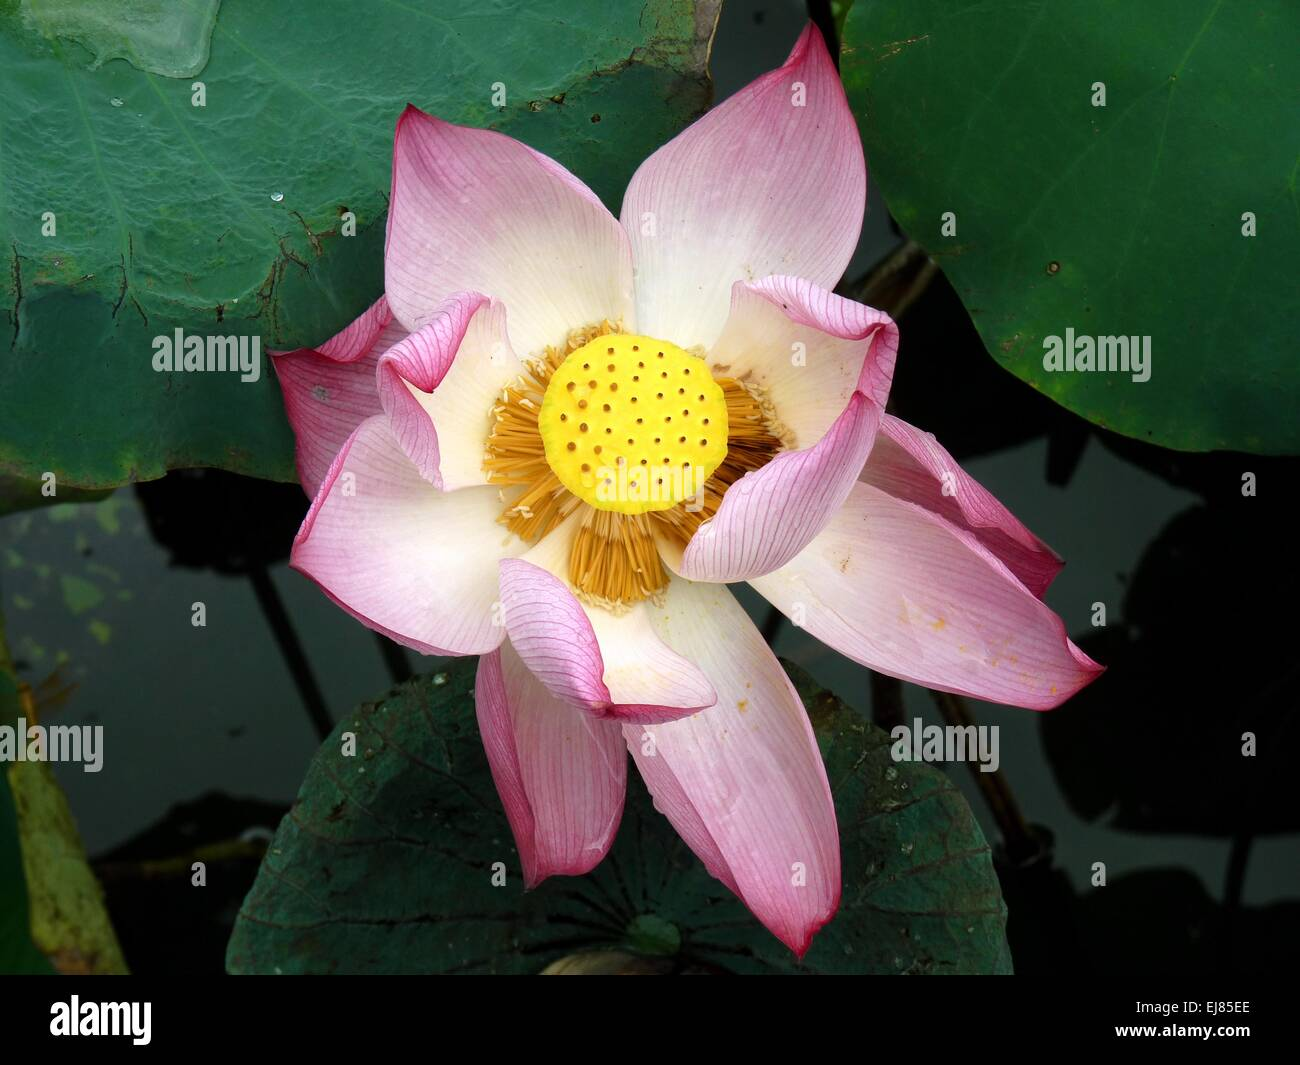 Opened Lotus Stock Photos Opened Lotus Stock Images Alamy